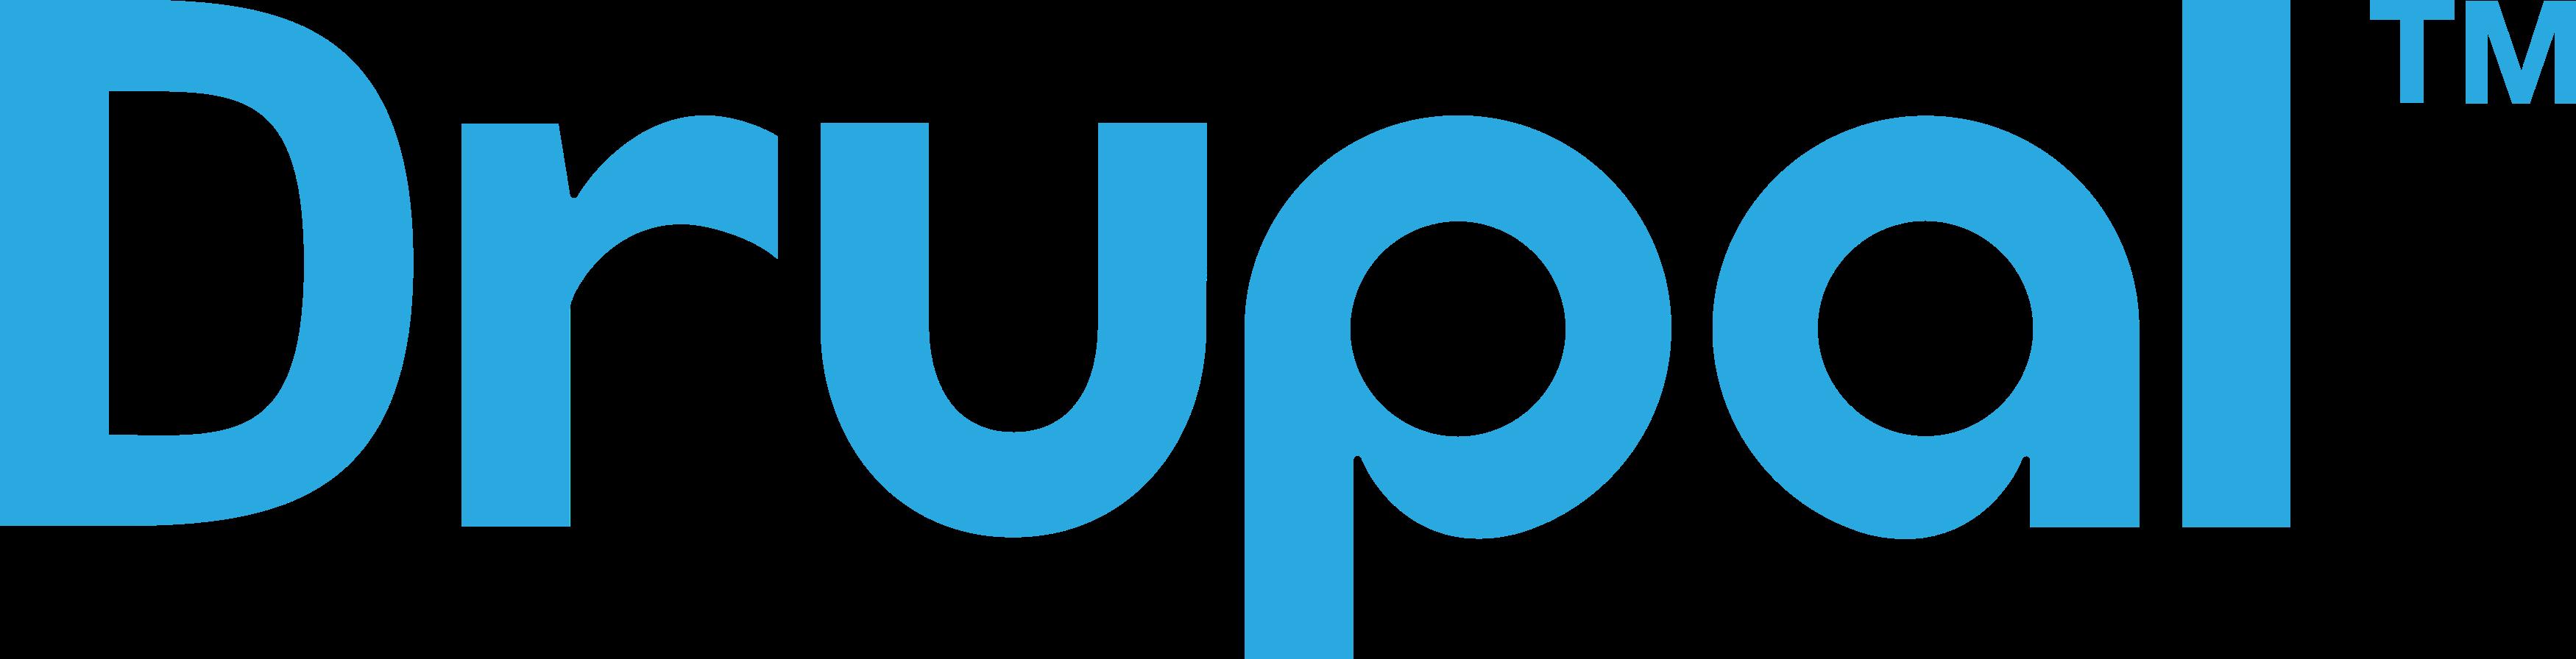 Drupal Logo.